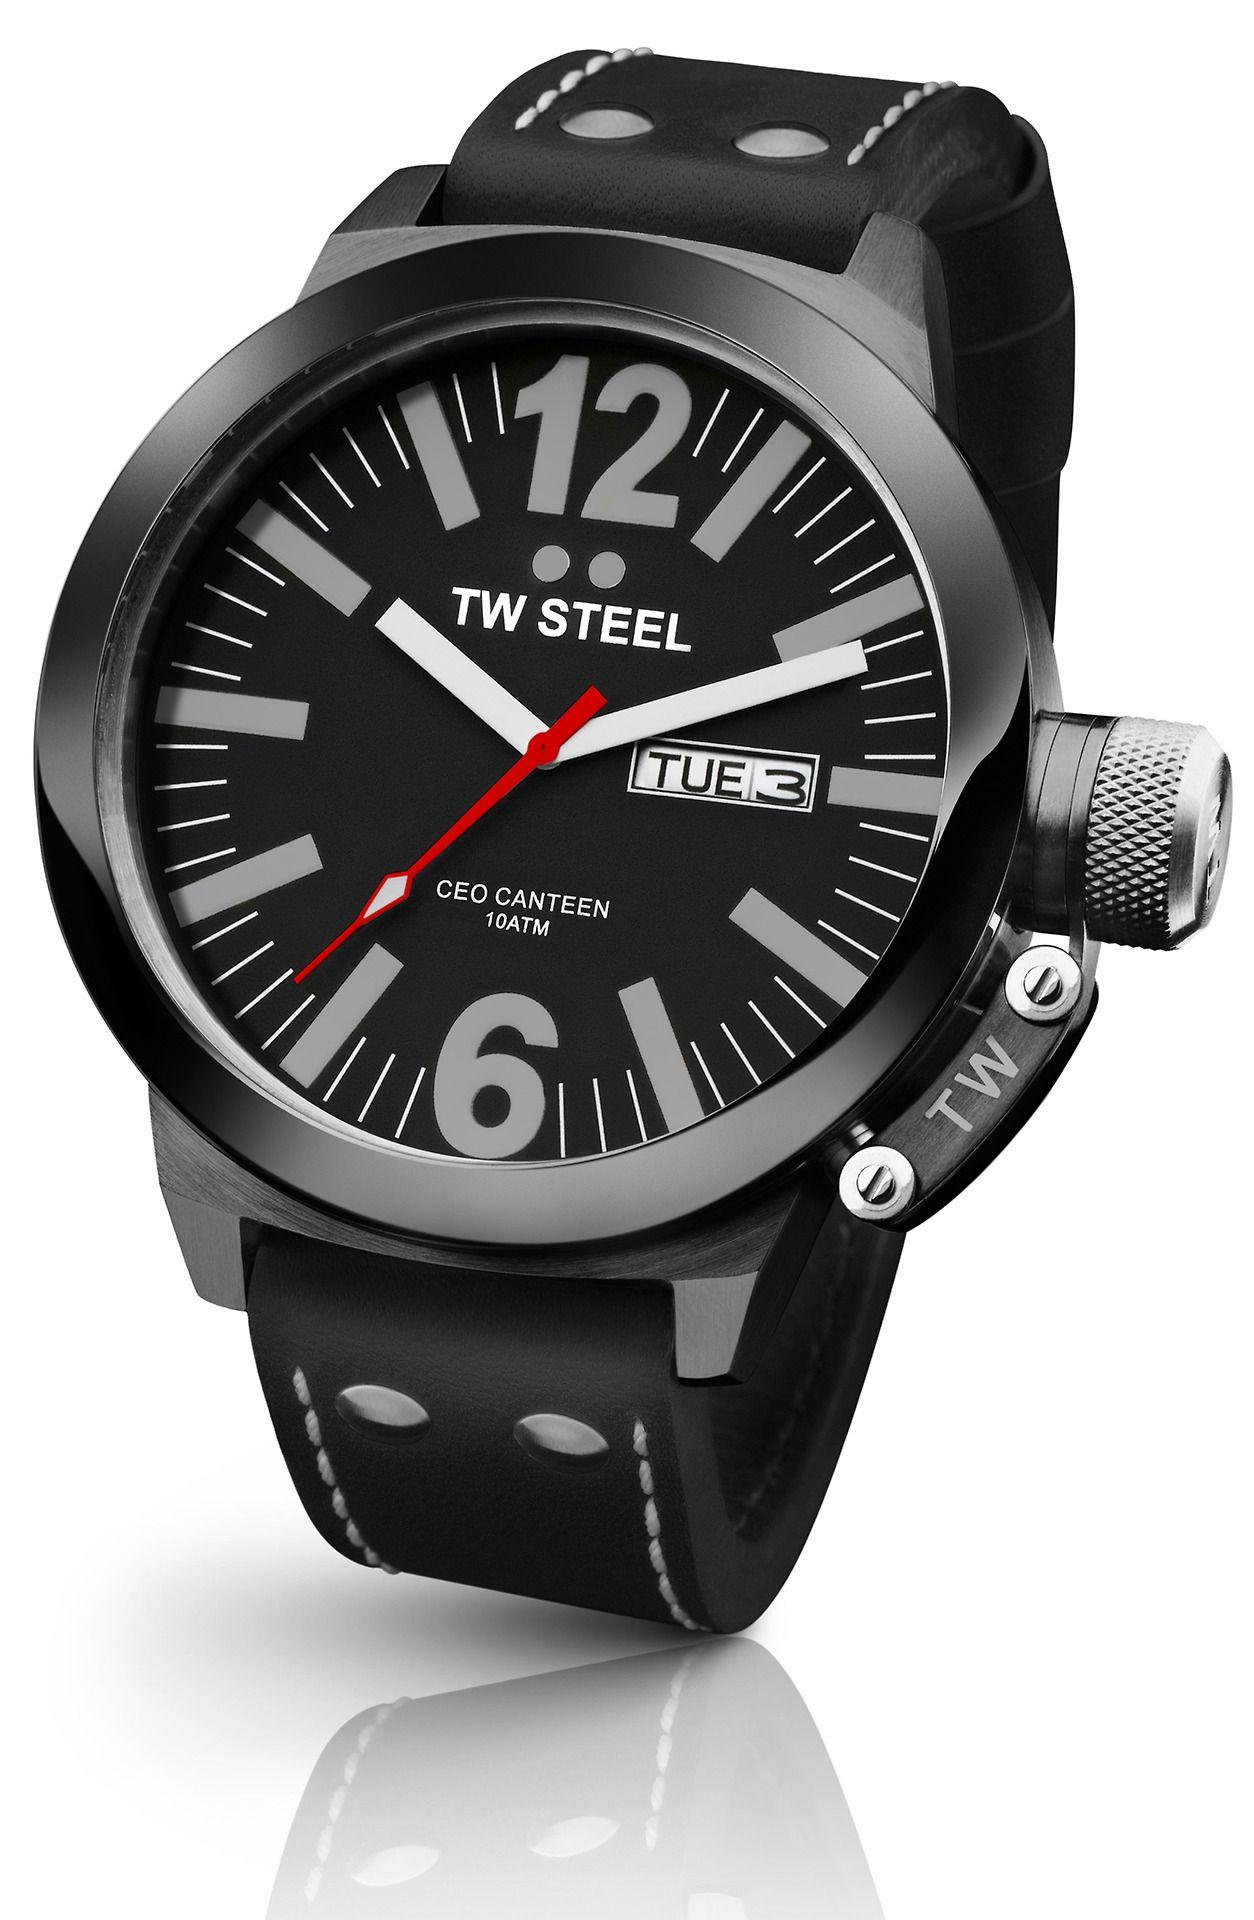 8aab1446c0ba Reloj de pulsera TW Steel CE1031 CEO Canteen